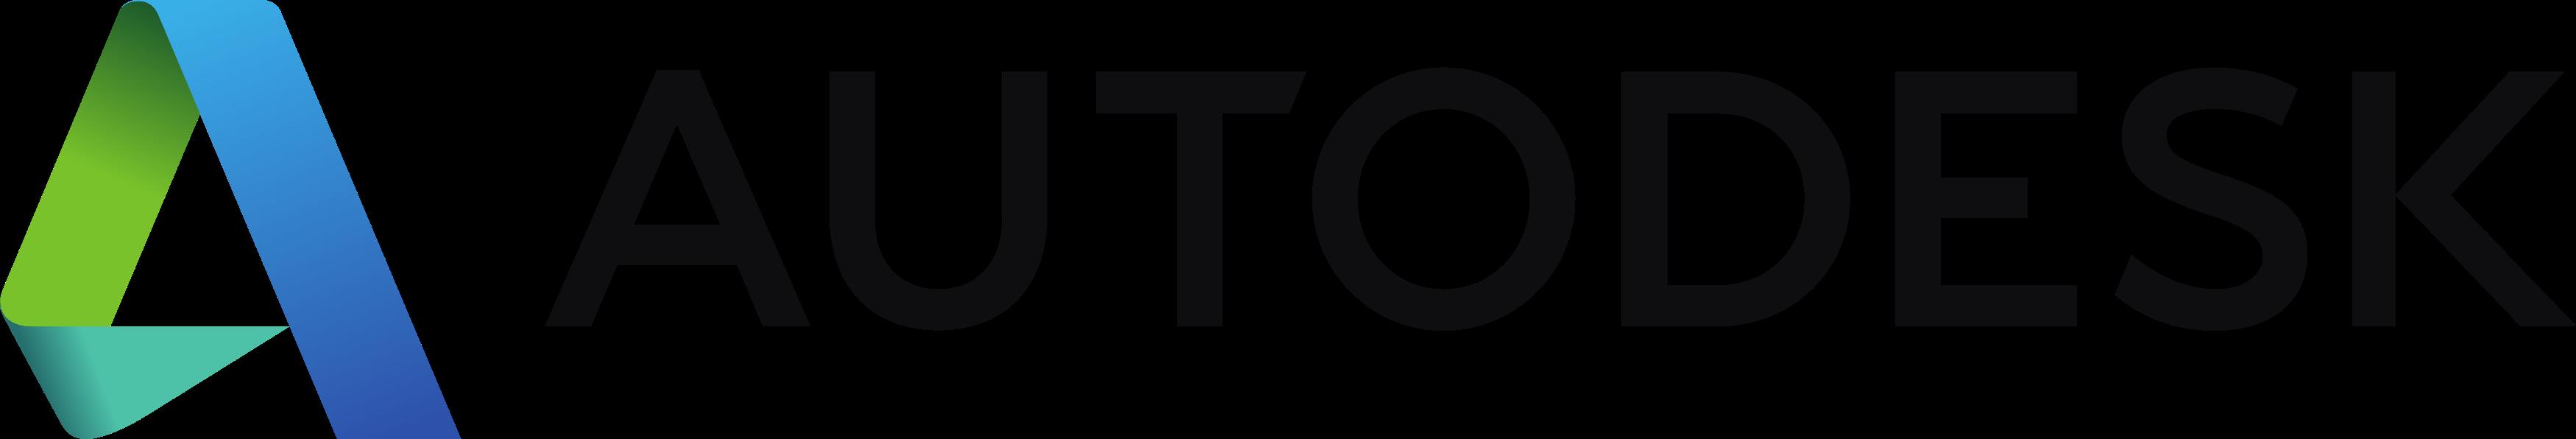 Autodesk Logo.